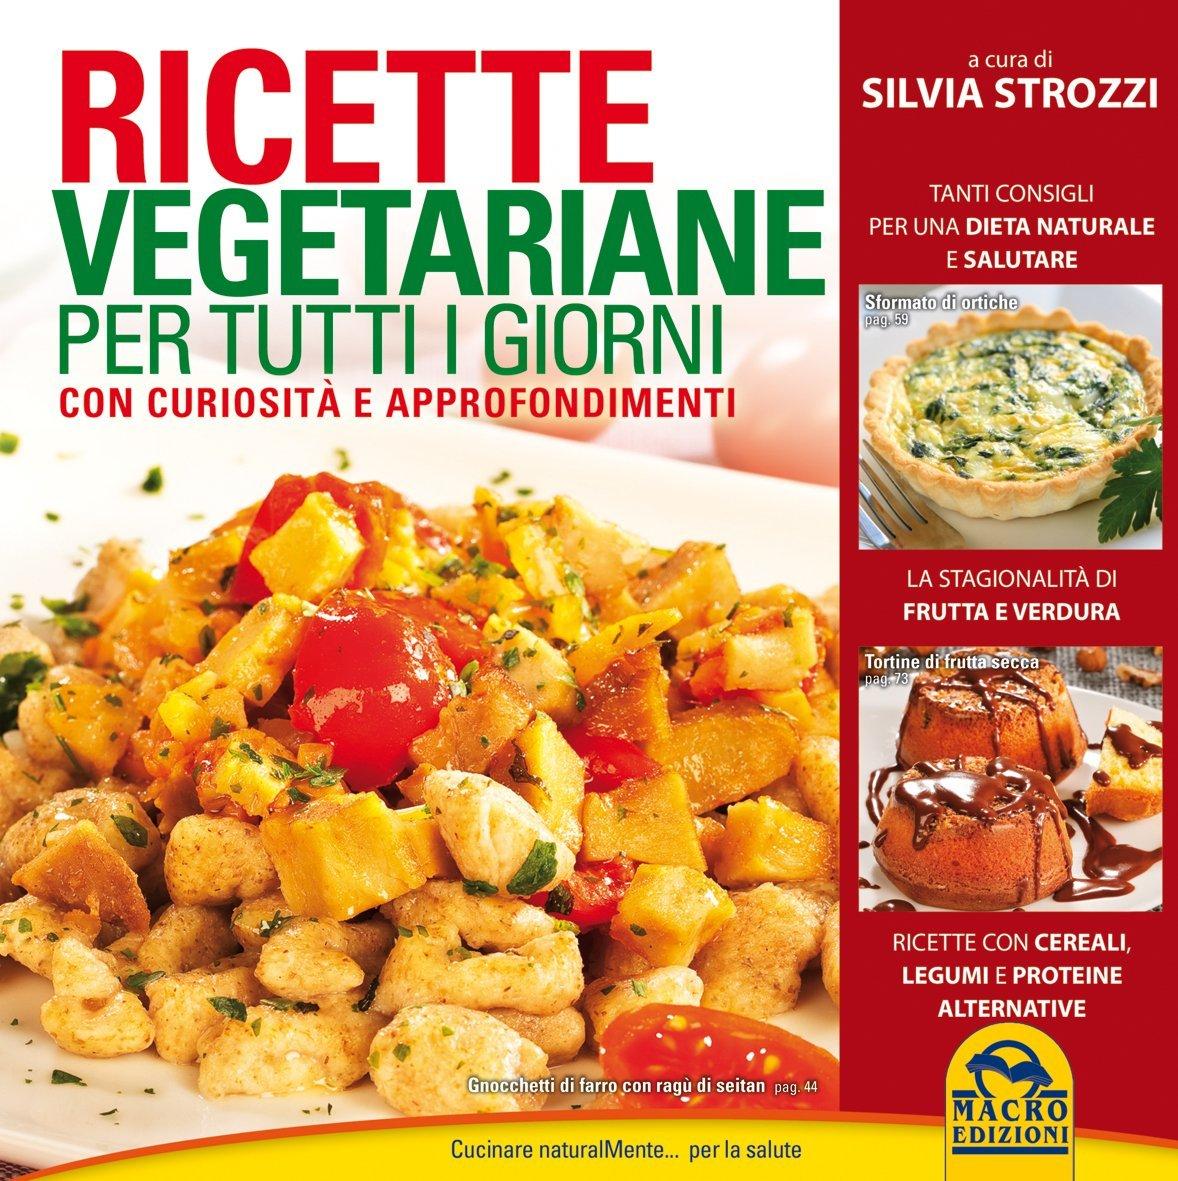 Ricette vegetariane per tutti i giorni ebook pdf di for Ricette vegetariane